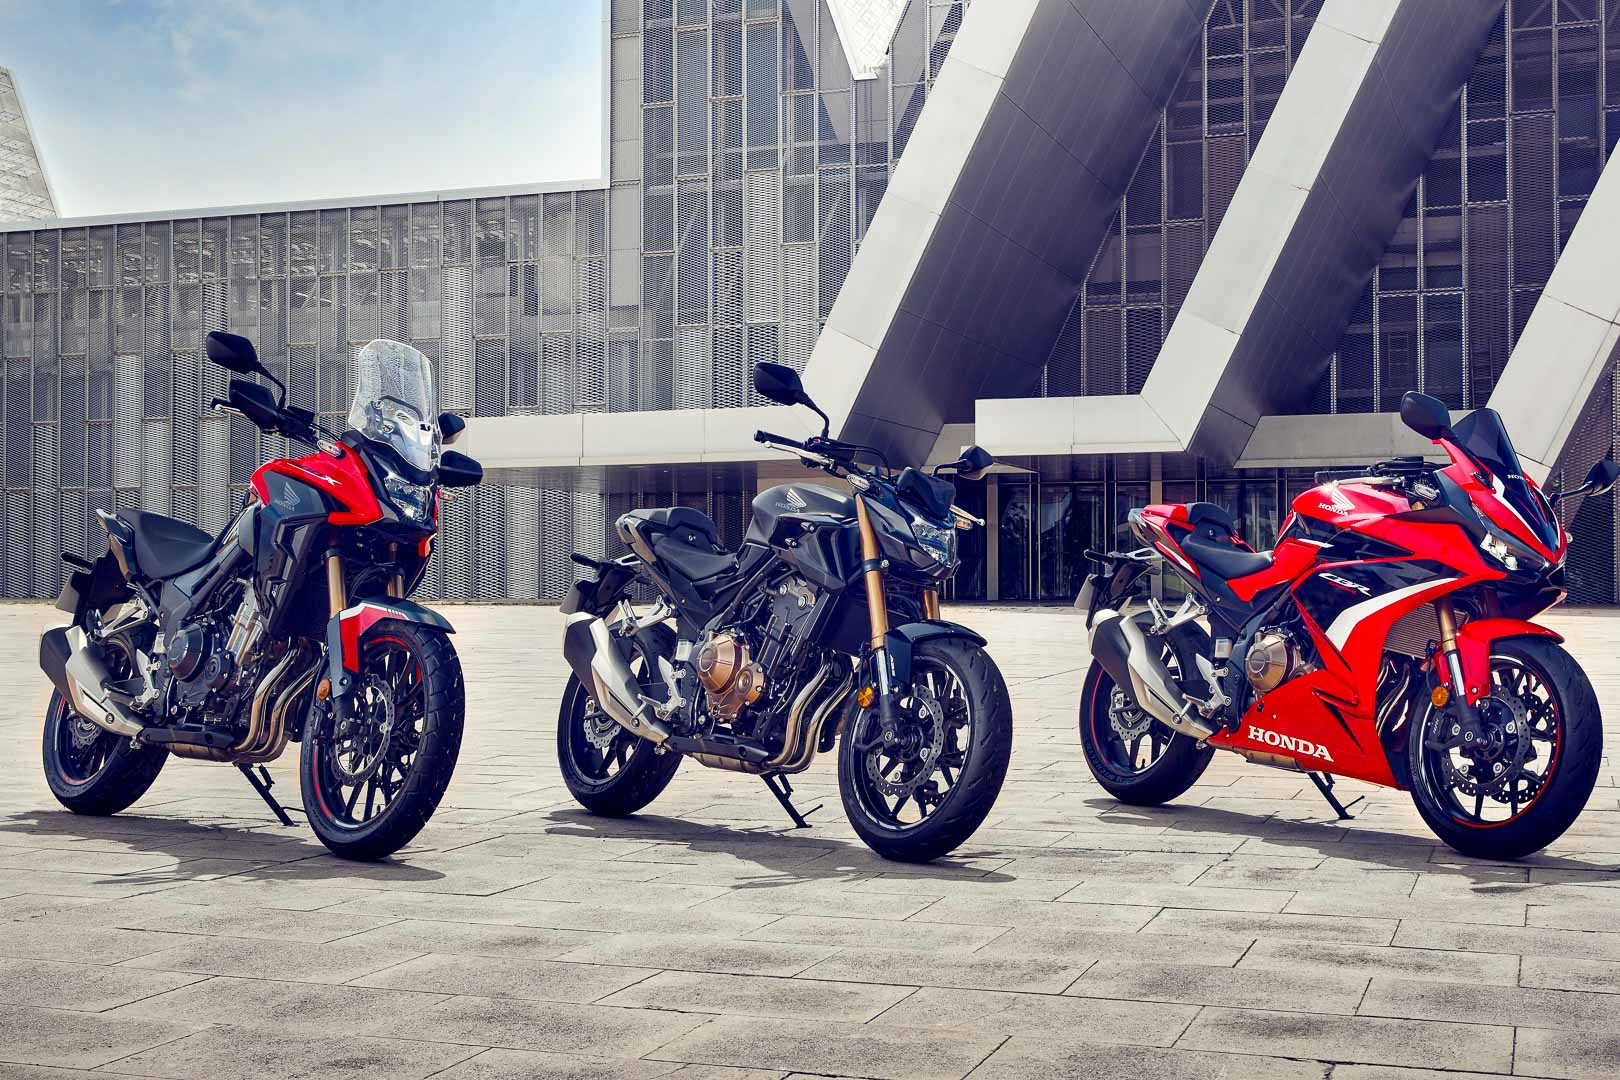 2022 Honda CB500 Lineup